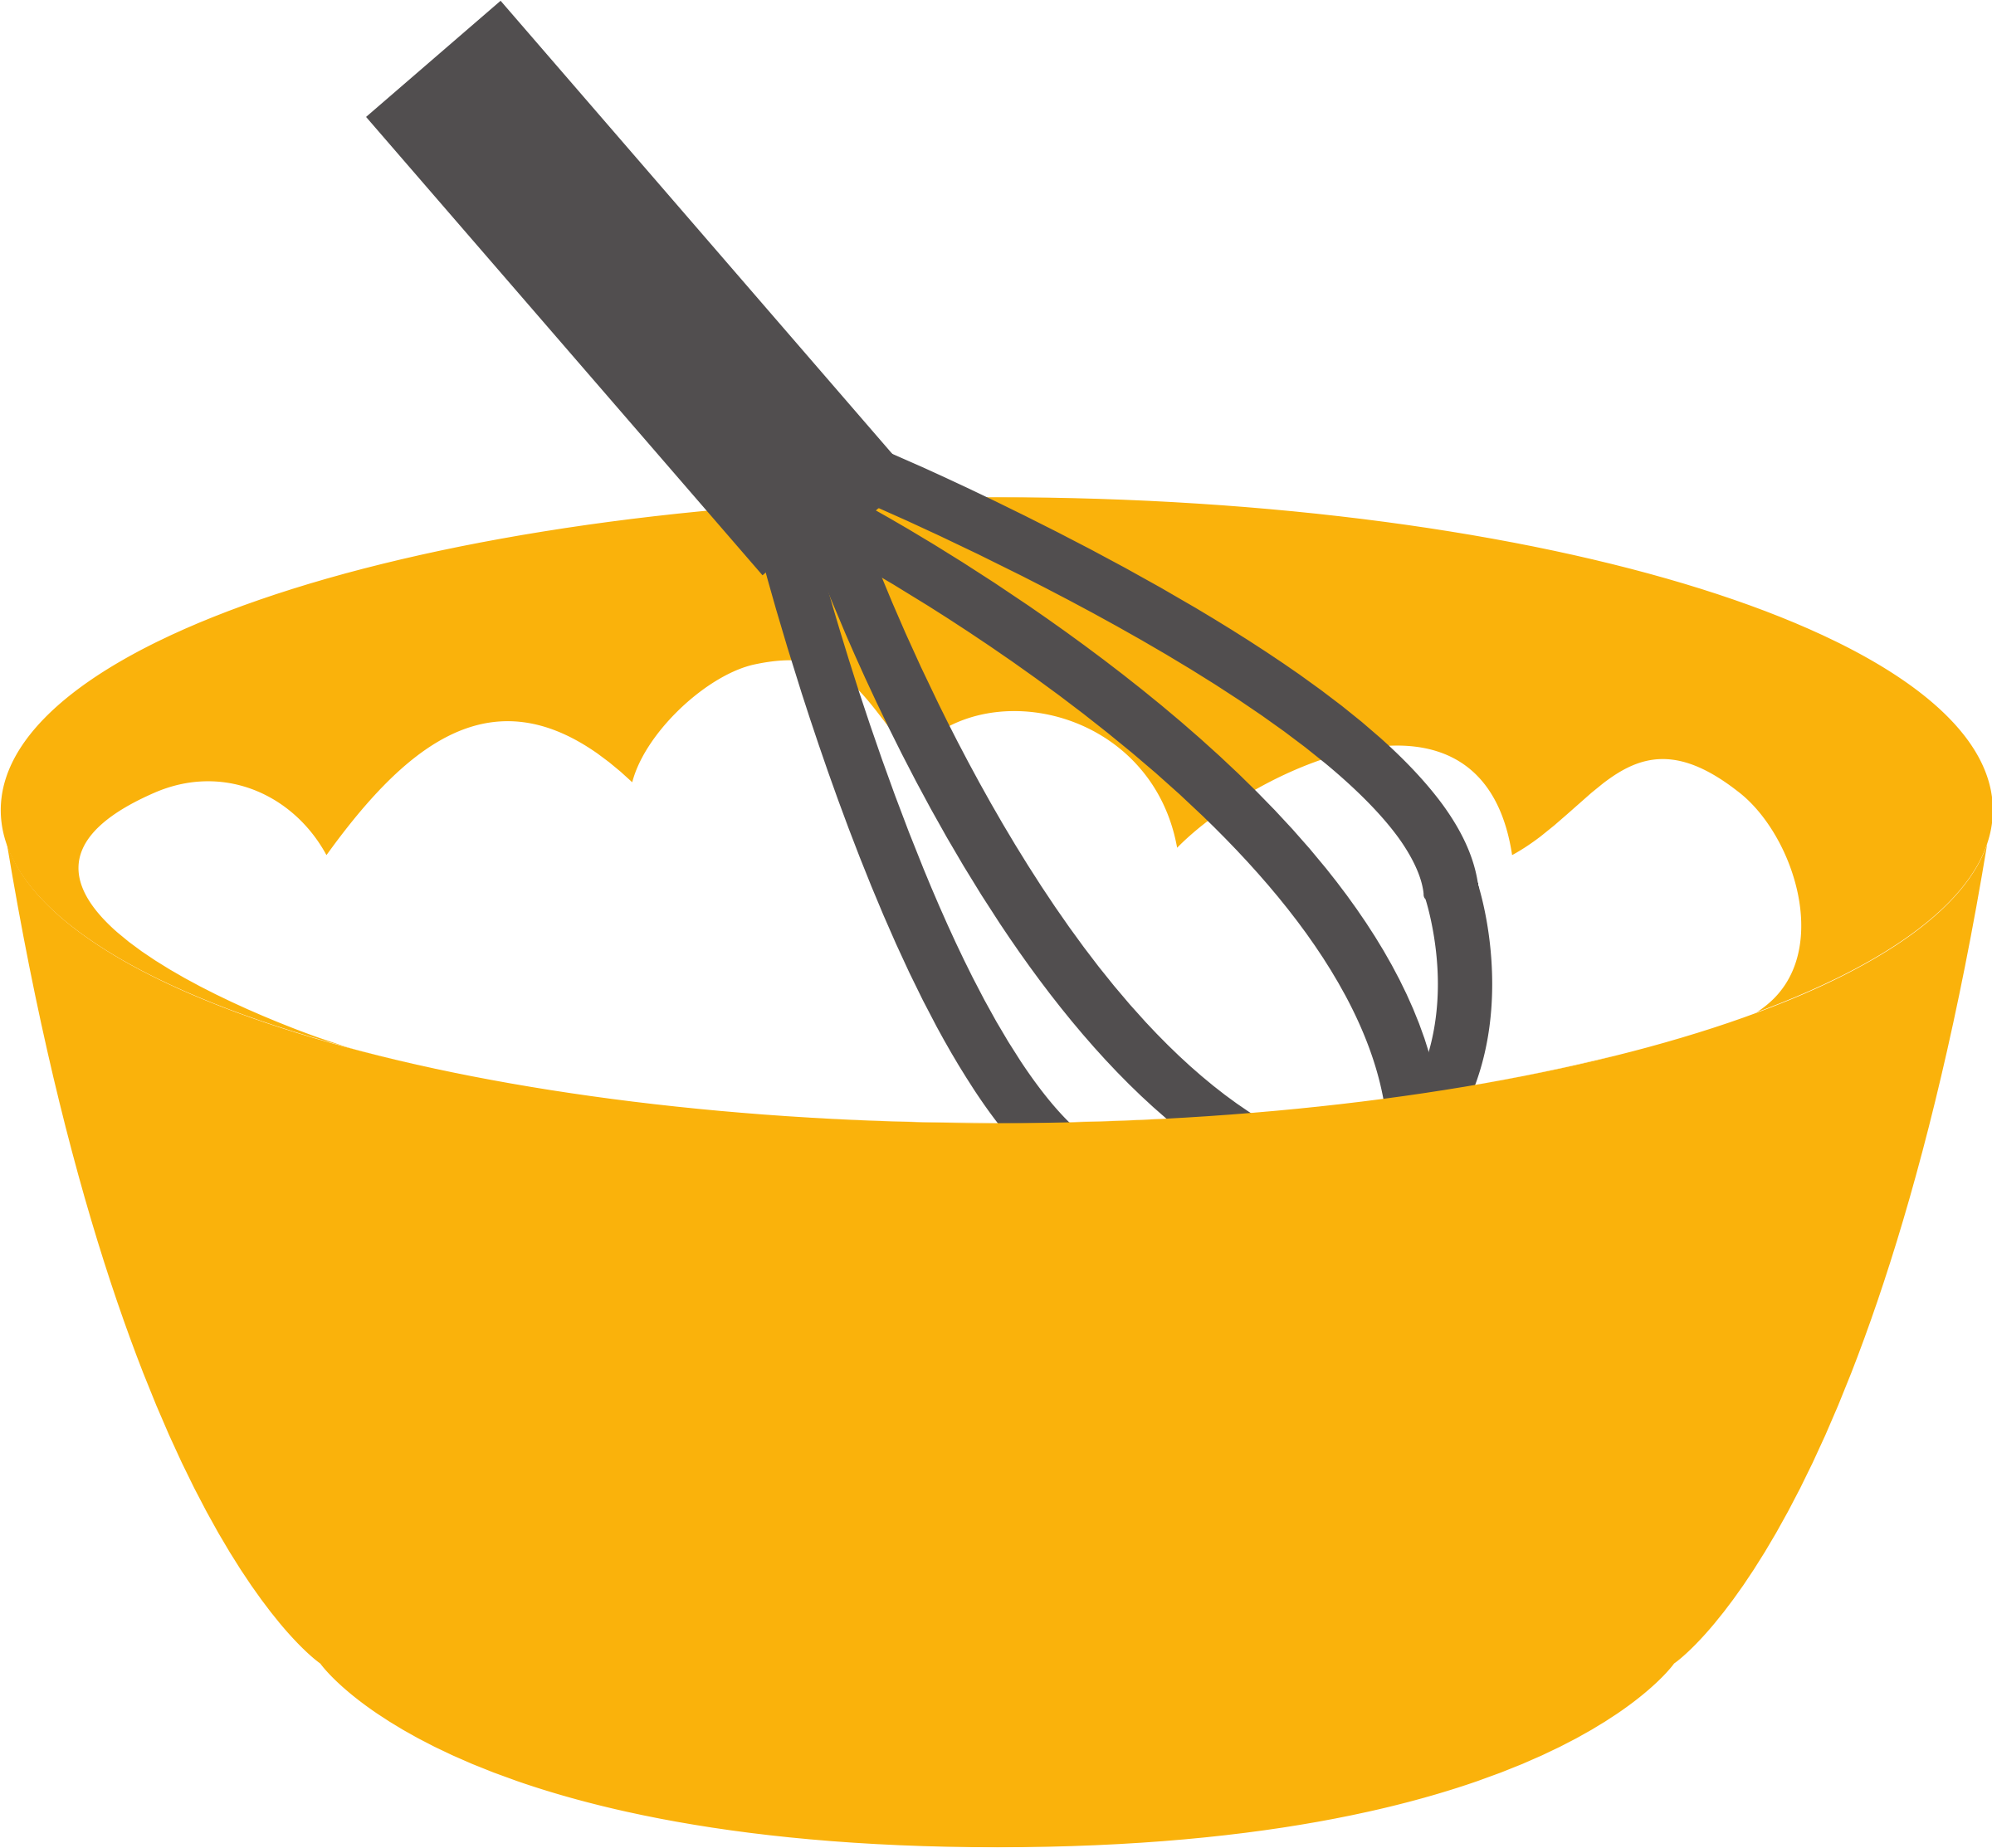 clip art download Baking clipart. Whisk bowl kitchen utensil